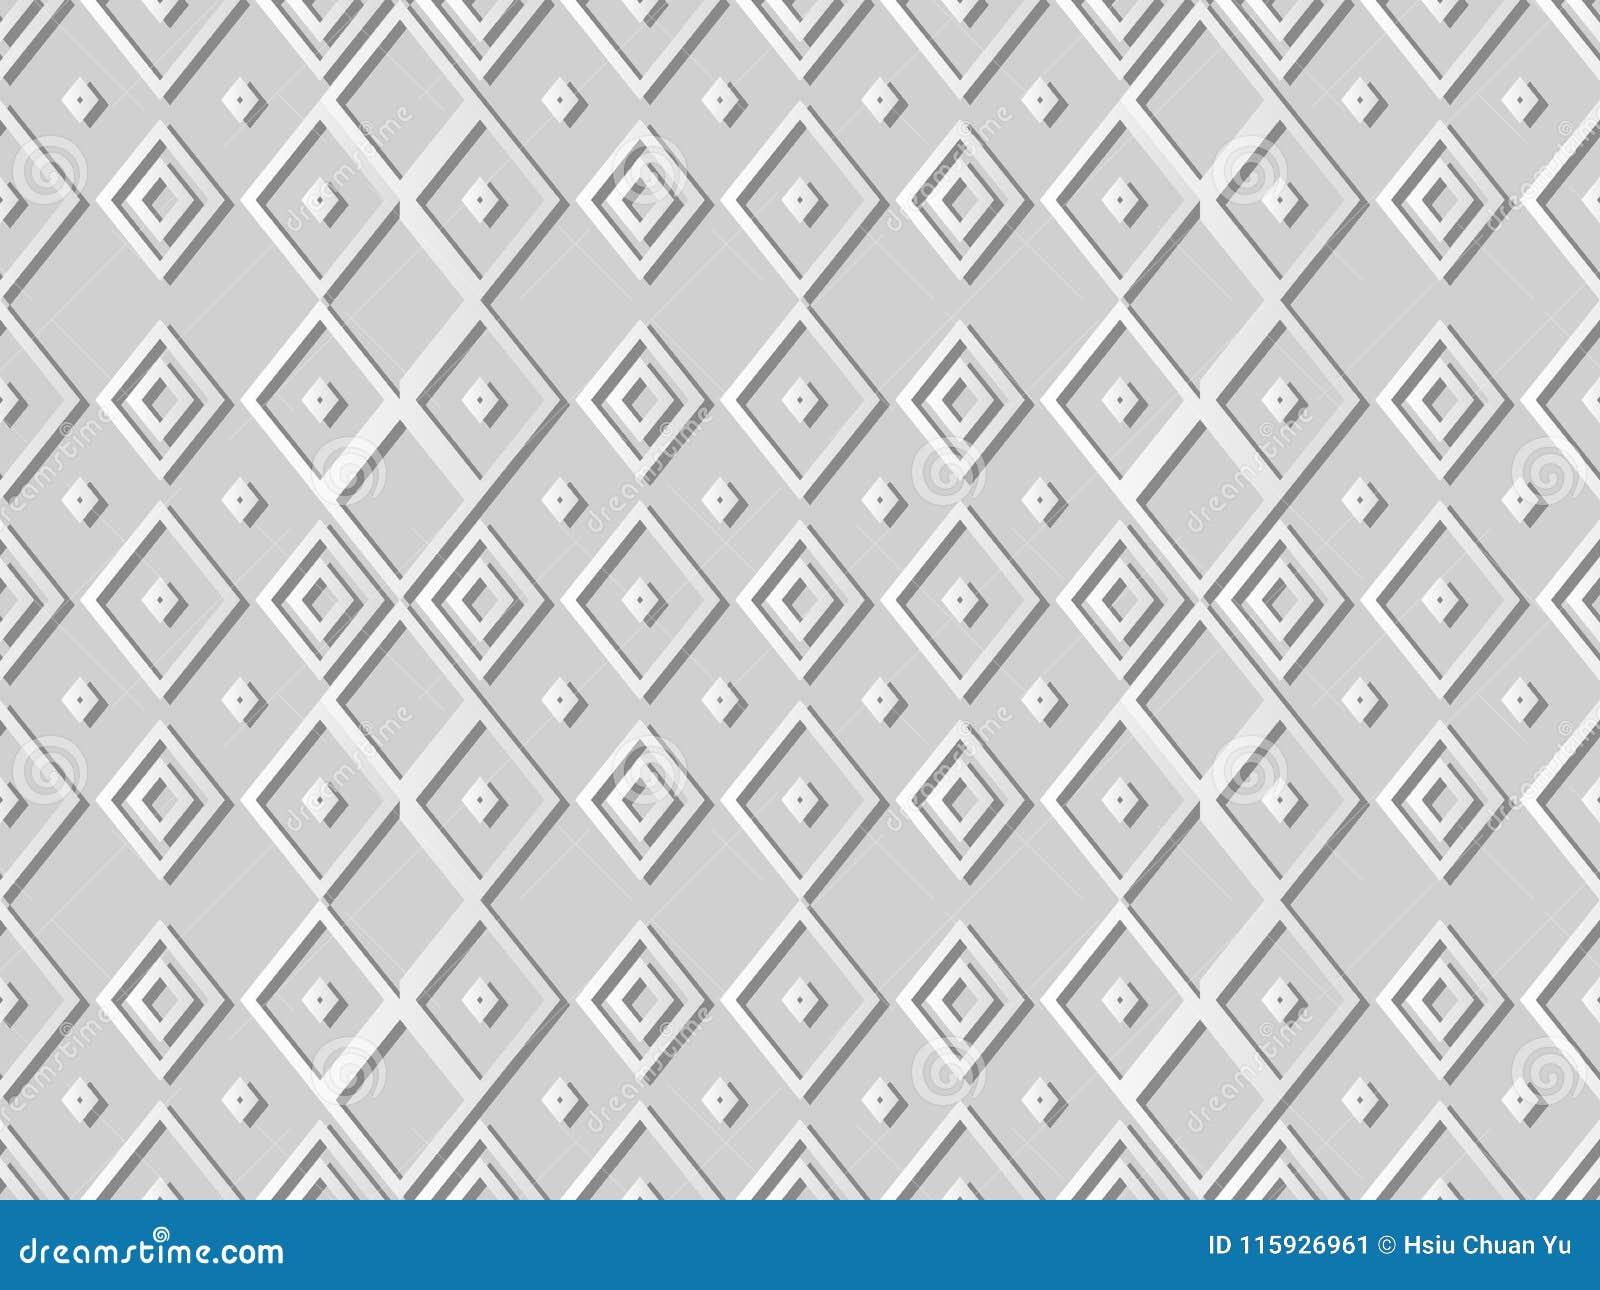 Arte Diamond Check Cross Rhomb Geometry del Libro Bianco 3D